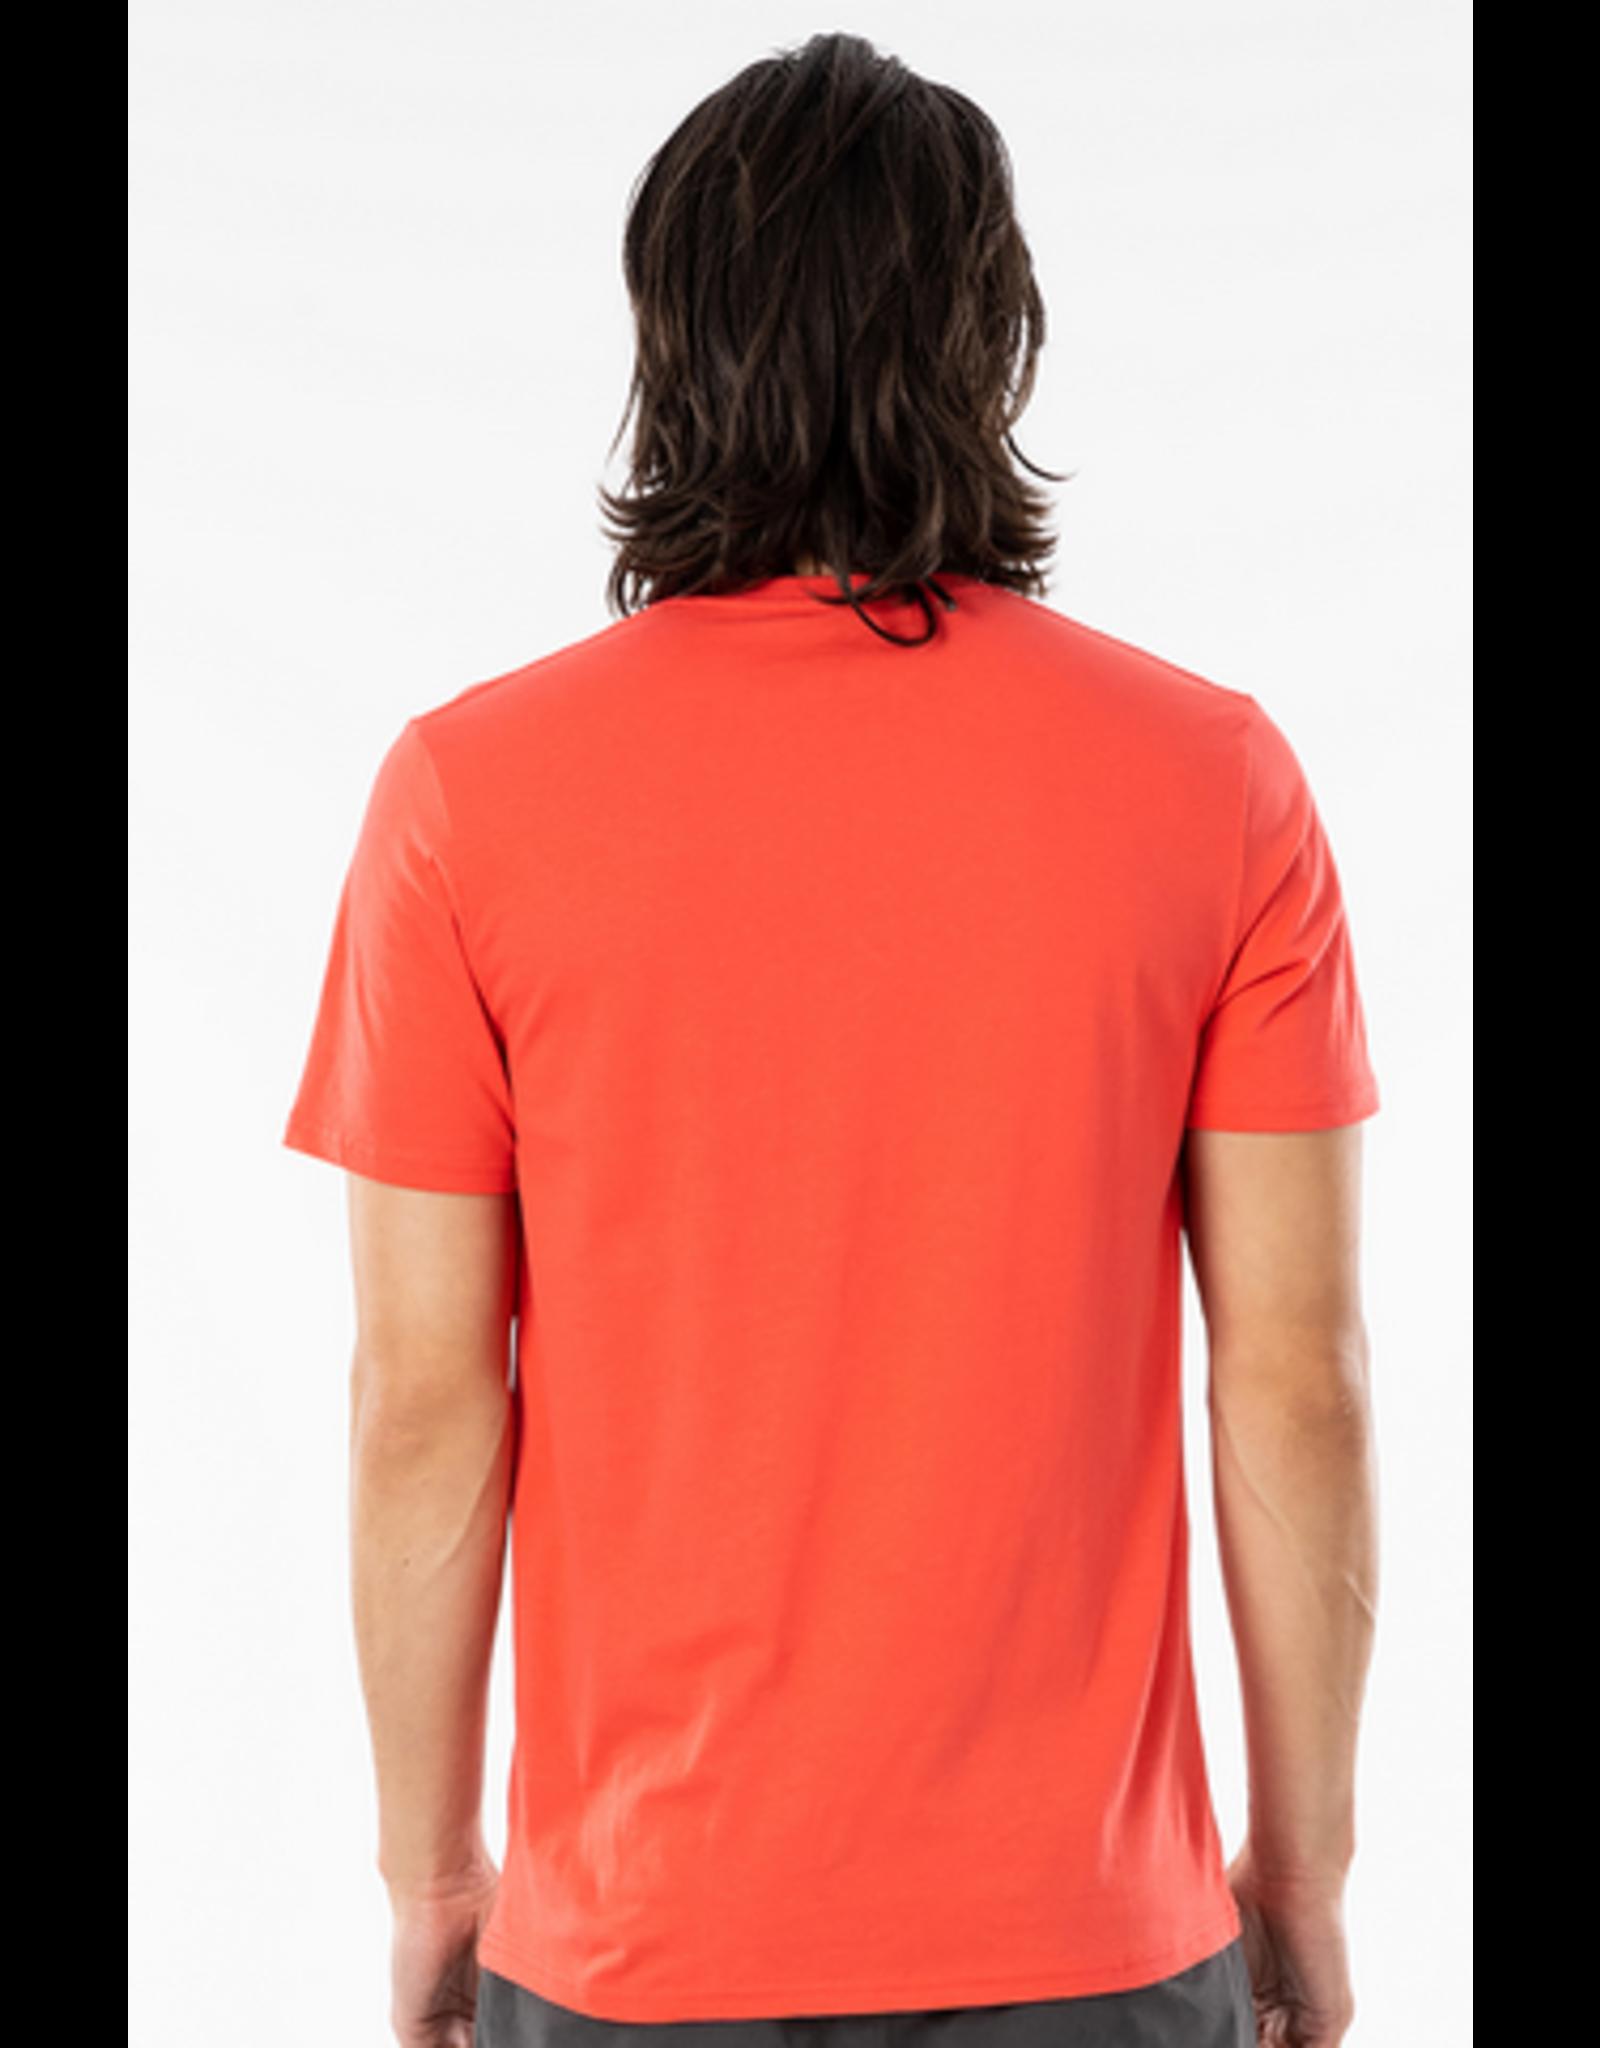 Rip Curl Rip Curl Endless Search T-shirt